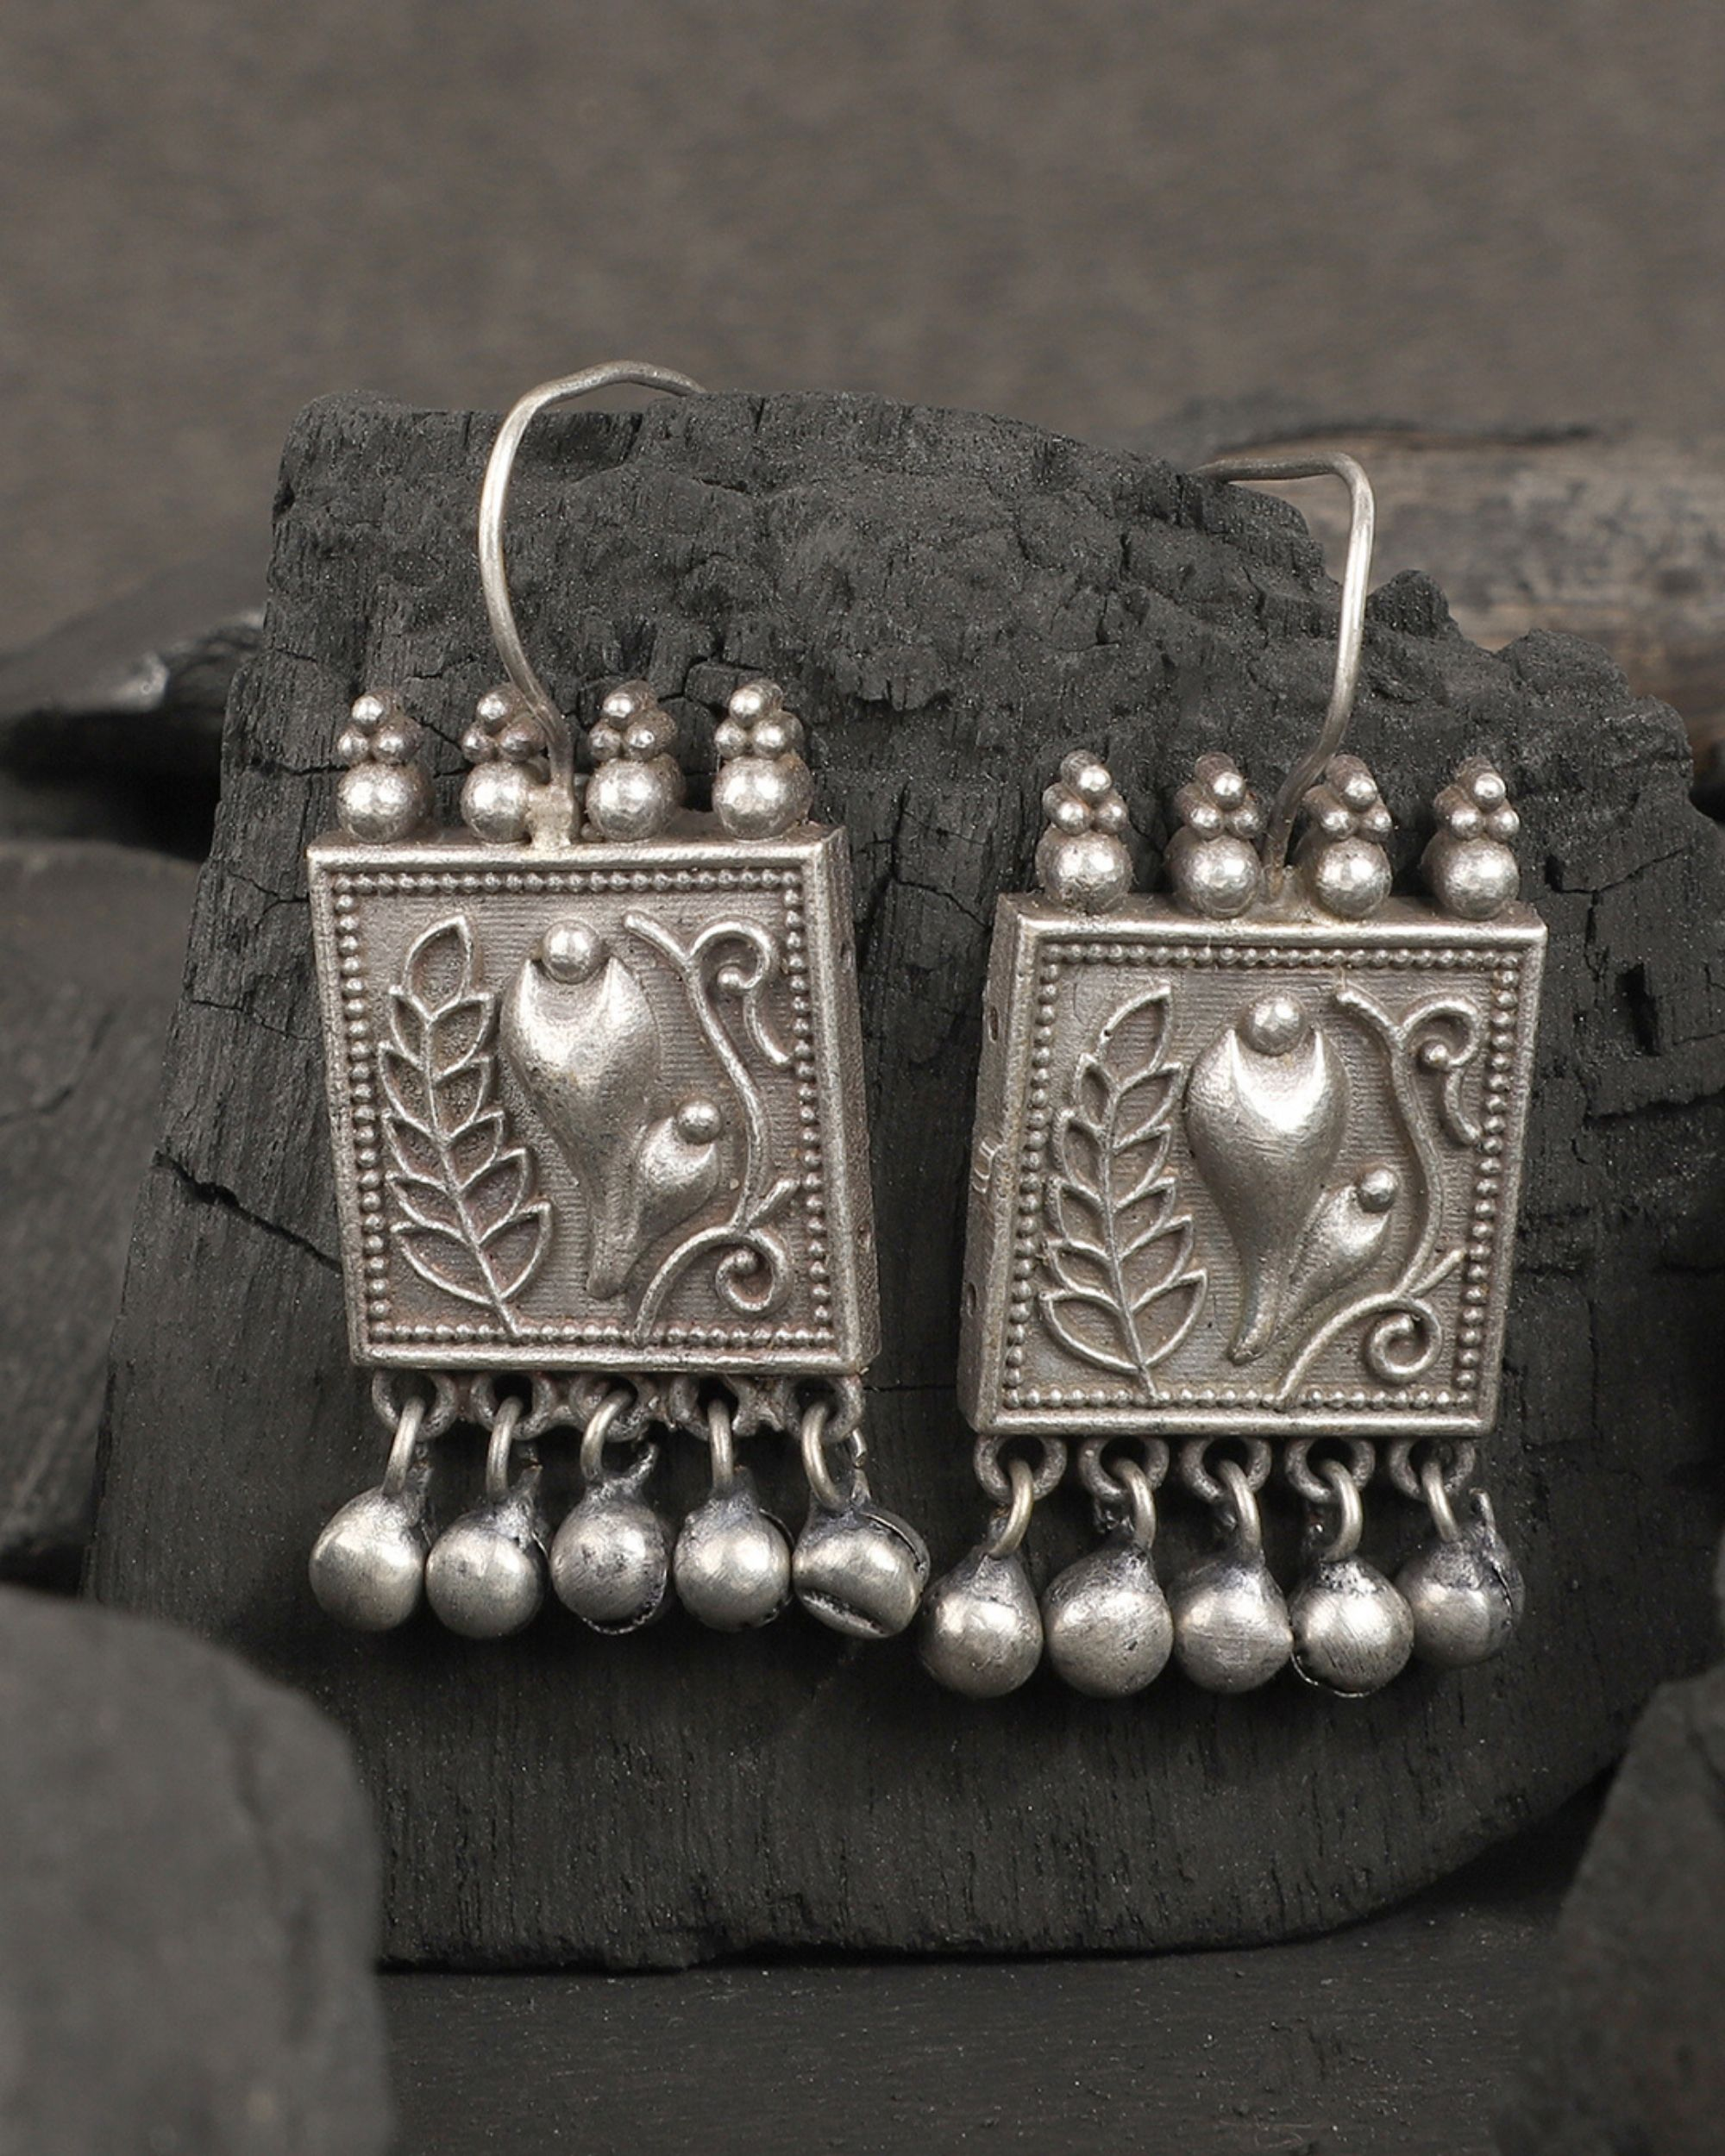 Bud and tulip earrings